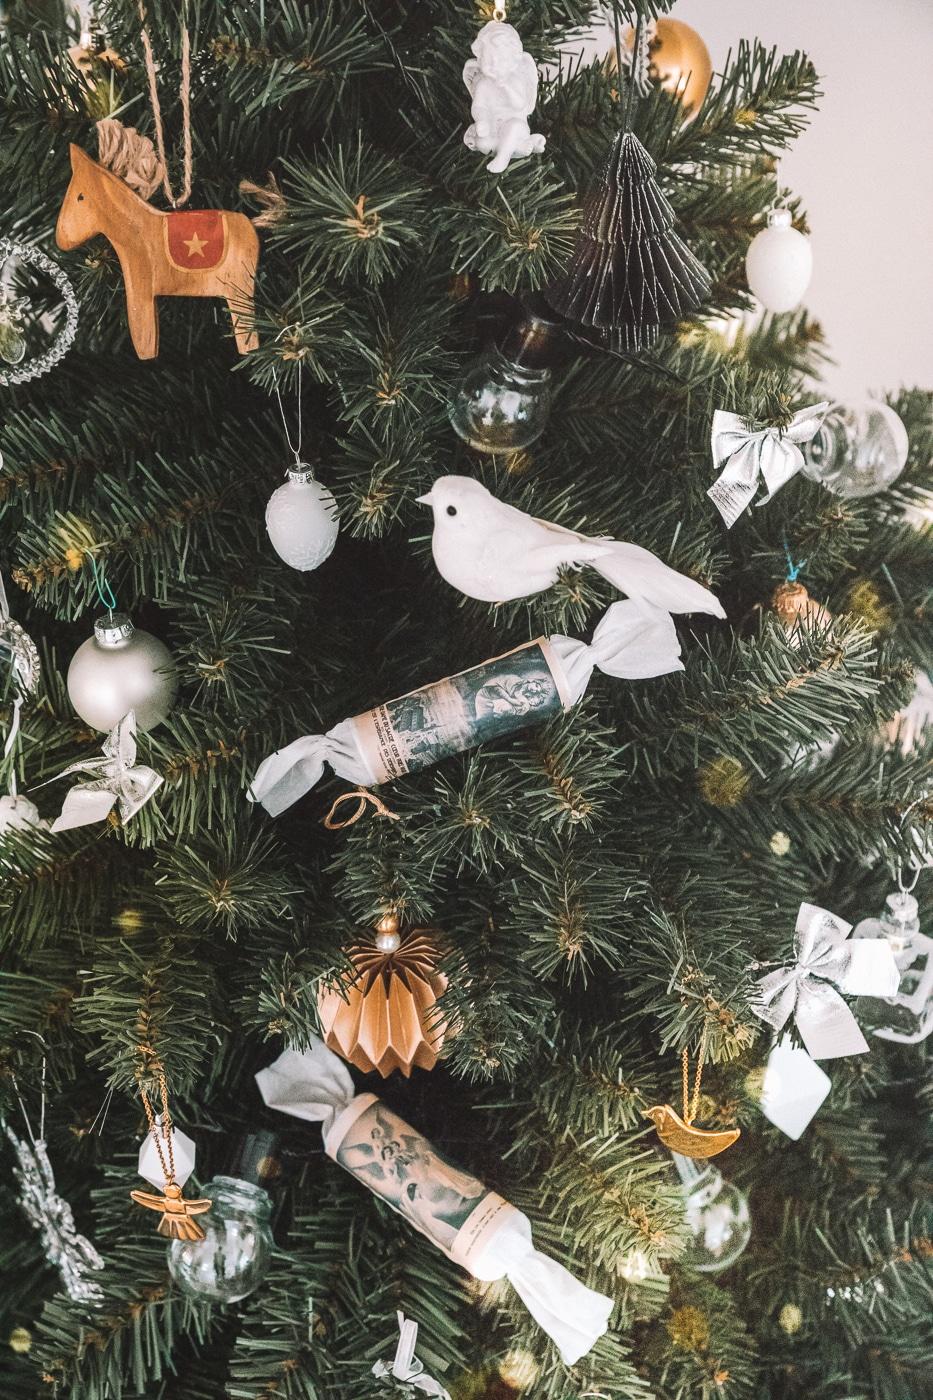 juletræ, julepynt, jul, inspiration til julekrans